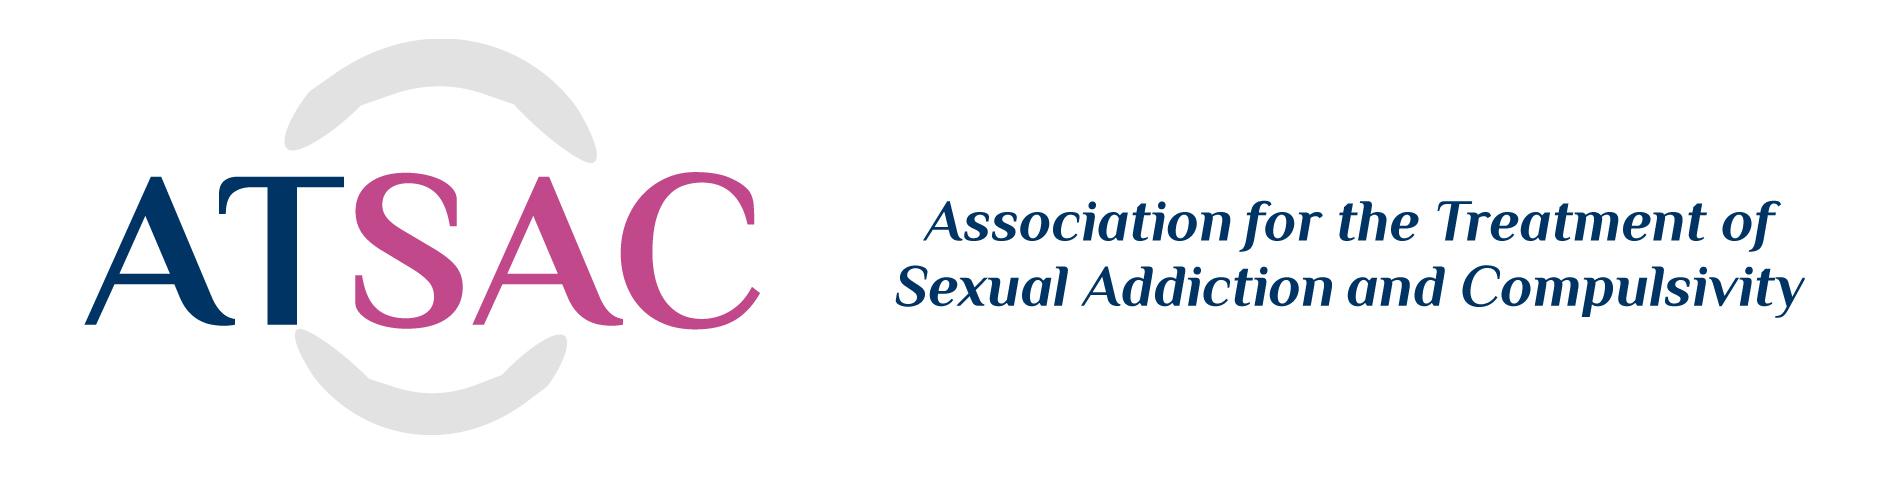 atsac-logo-landscape.jpg